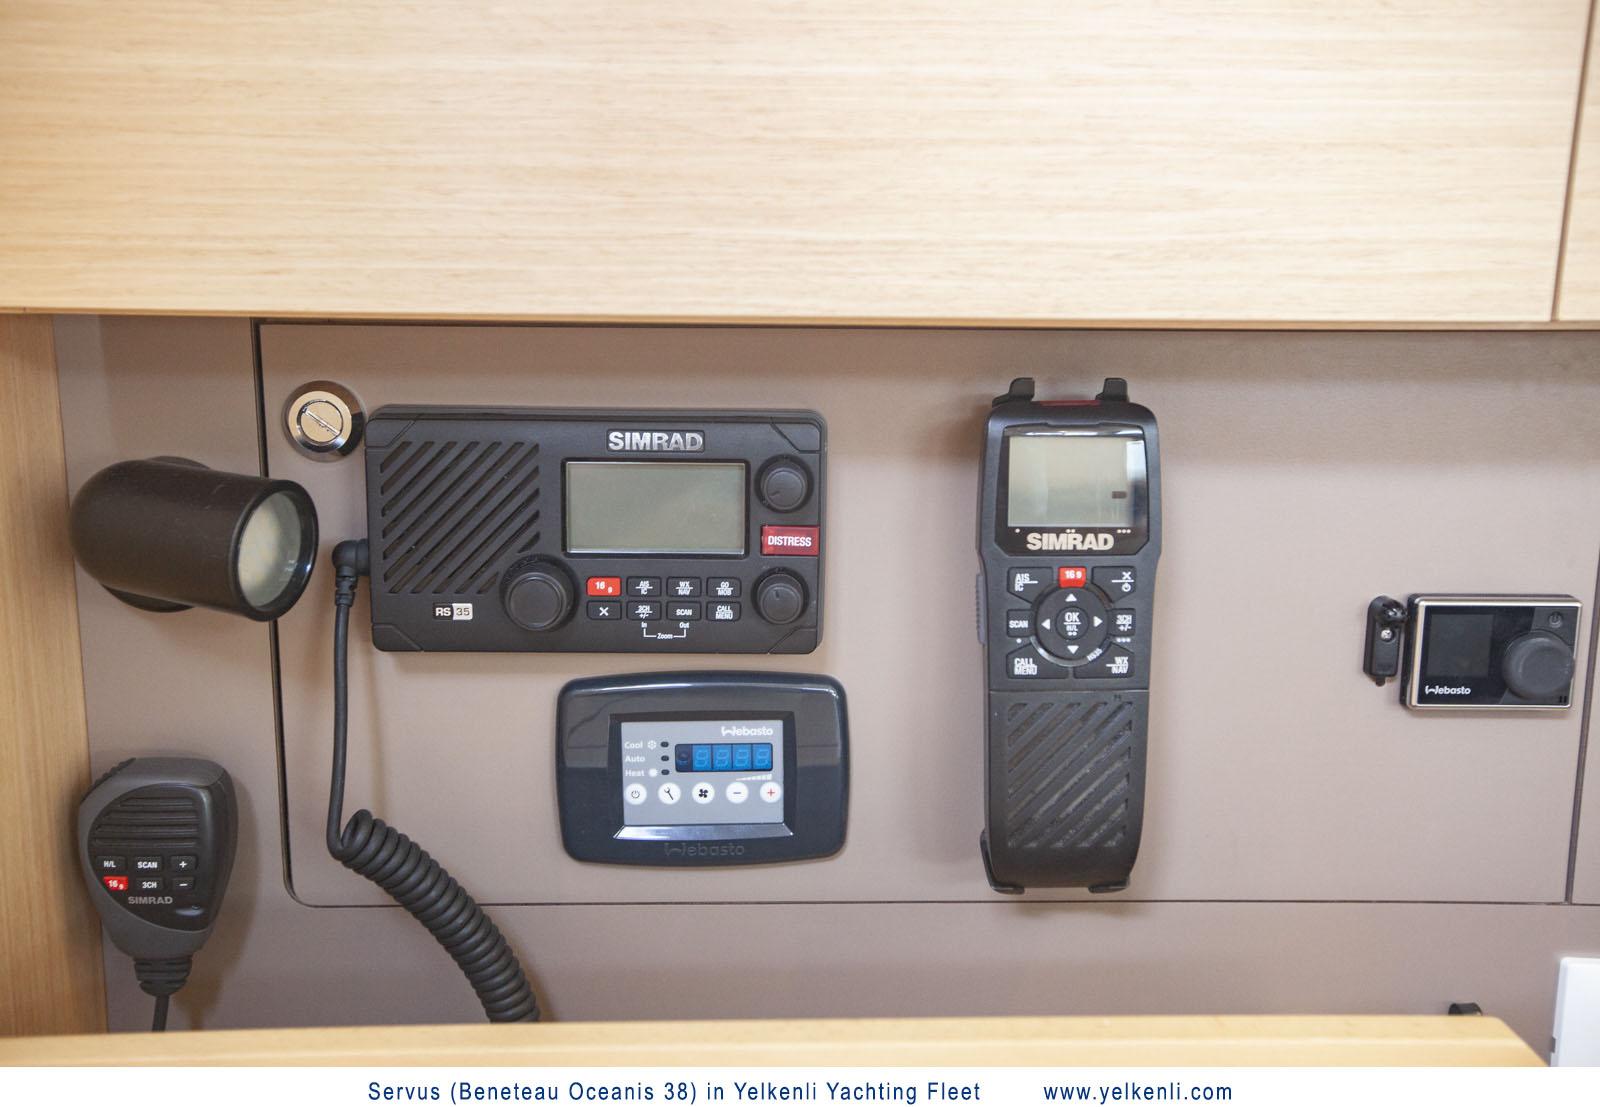 Oceanis 38 (Servus) VHF and Controls - 7